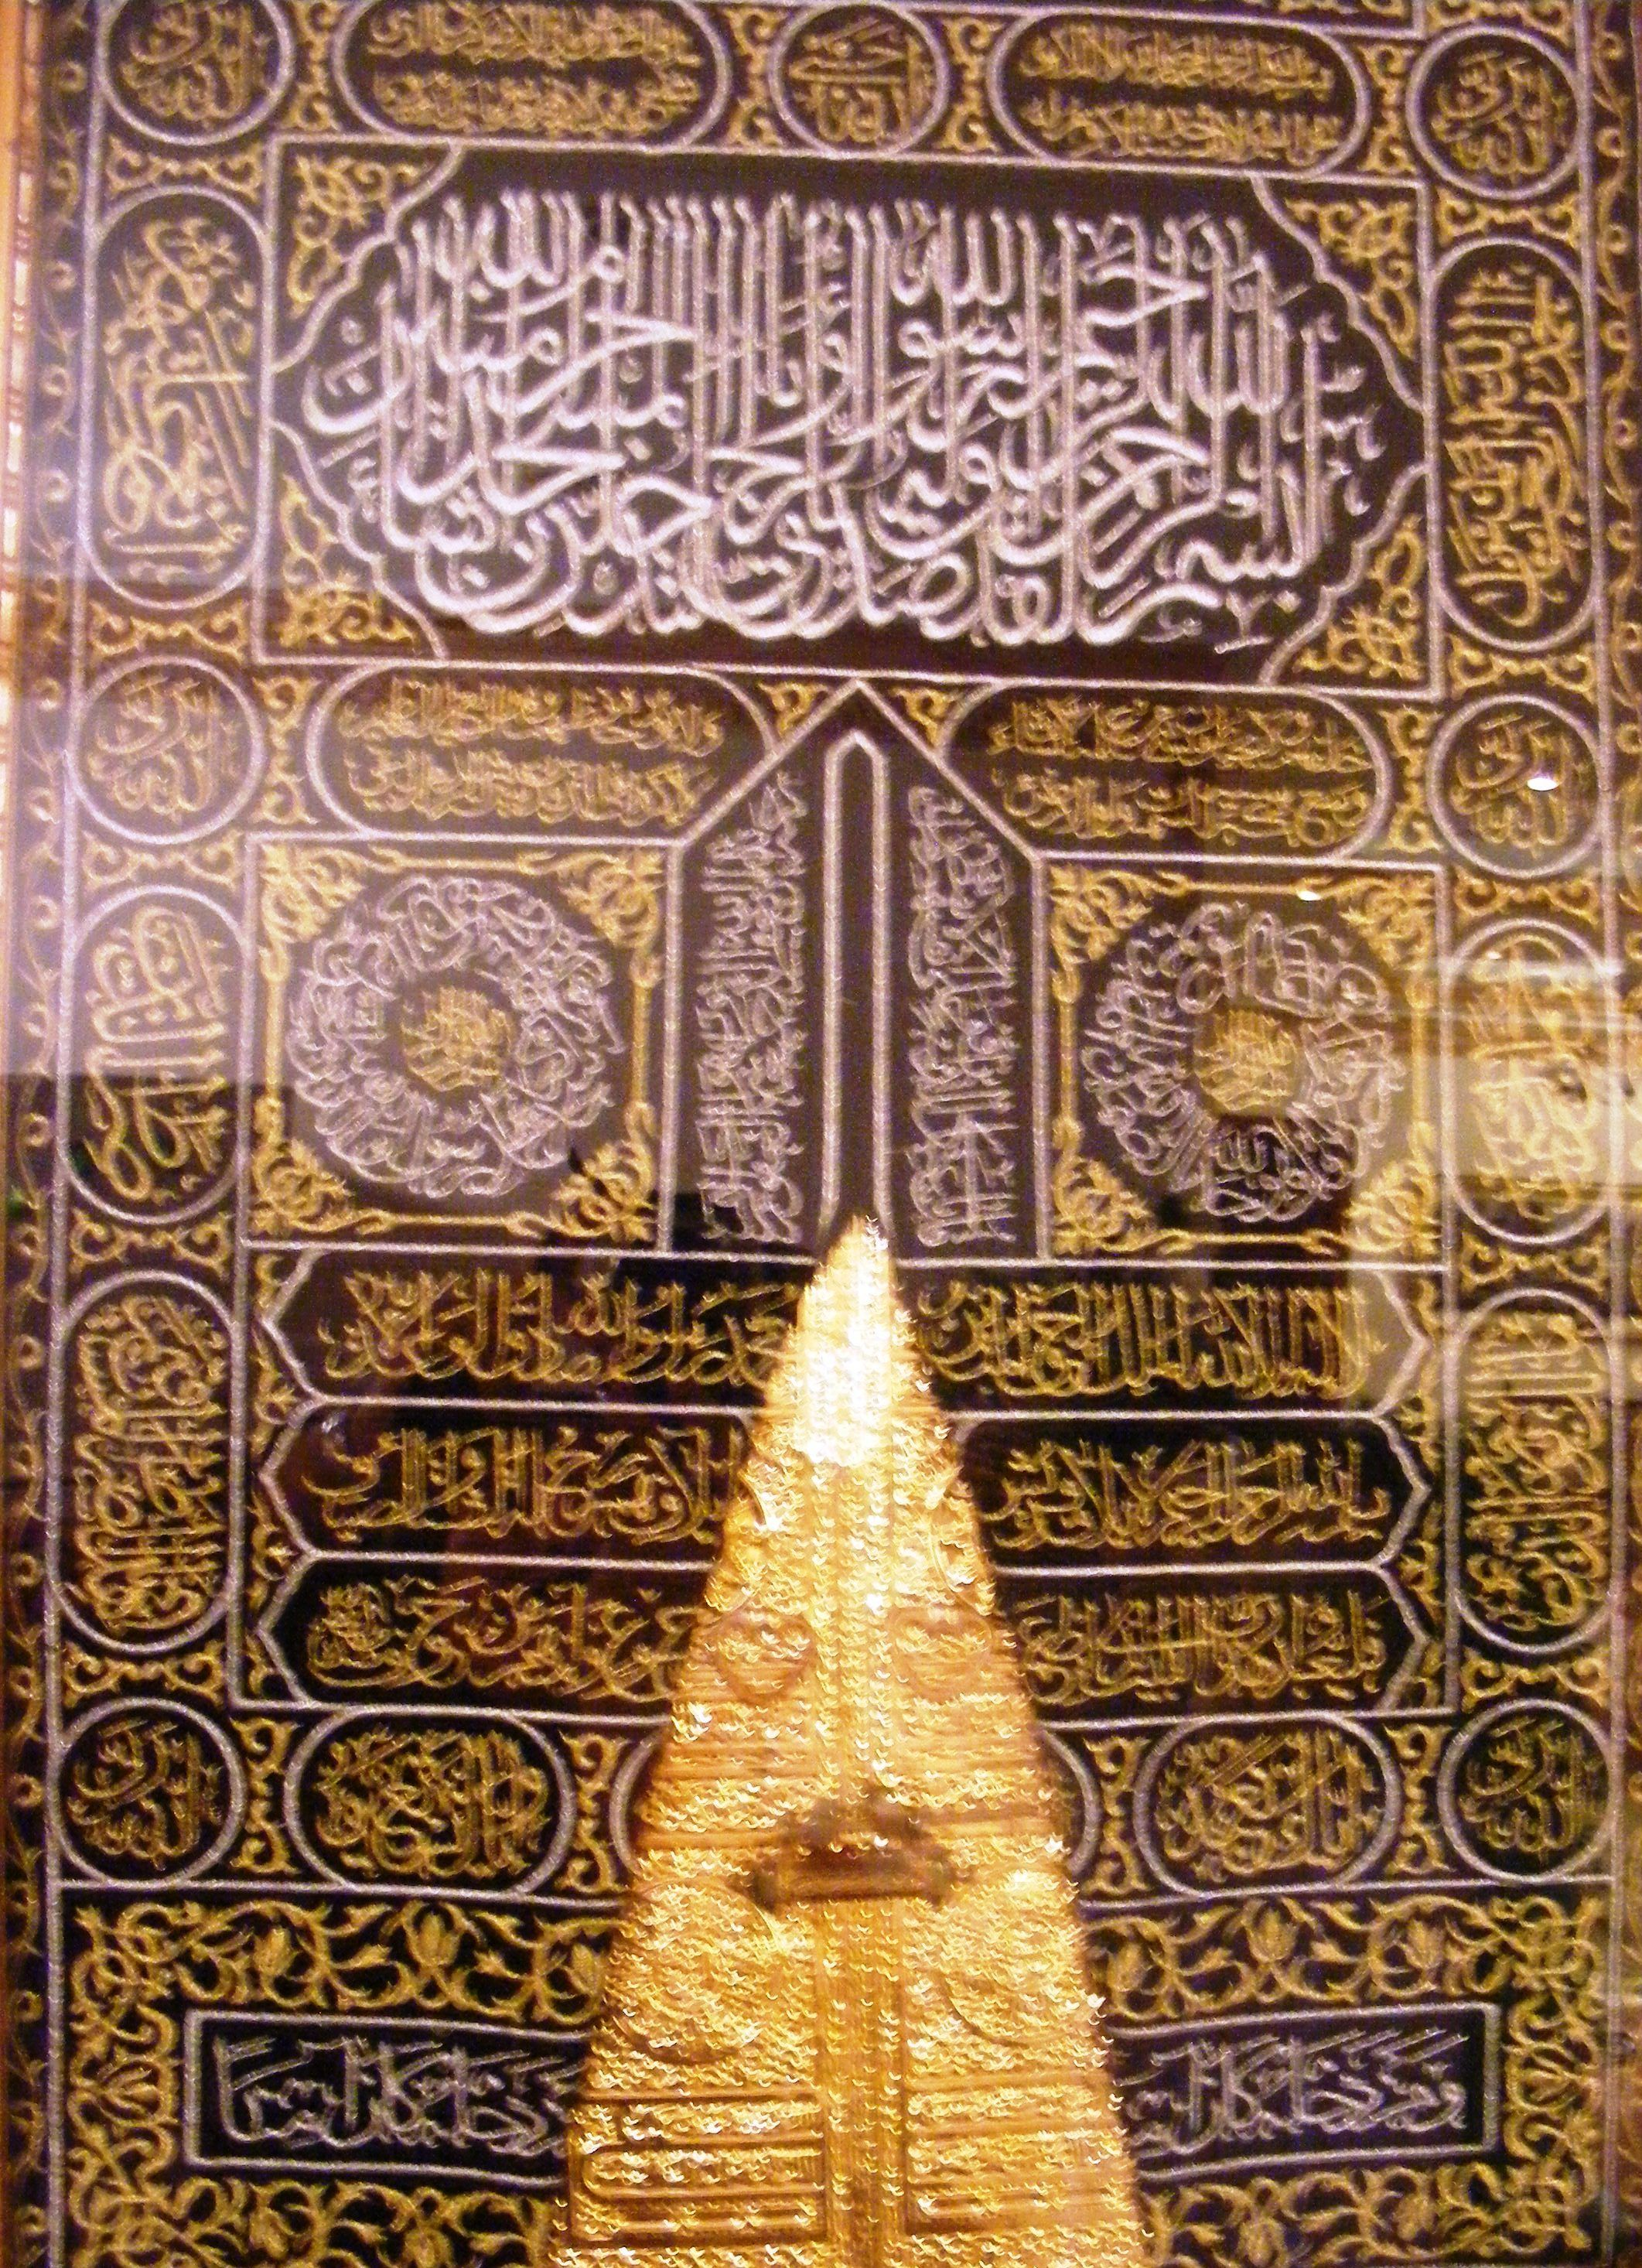 Elaborate Islamic Verse Islamic Calligraphy Elaborate Oil Painting